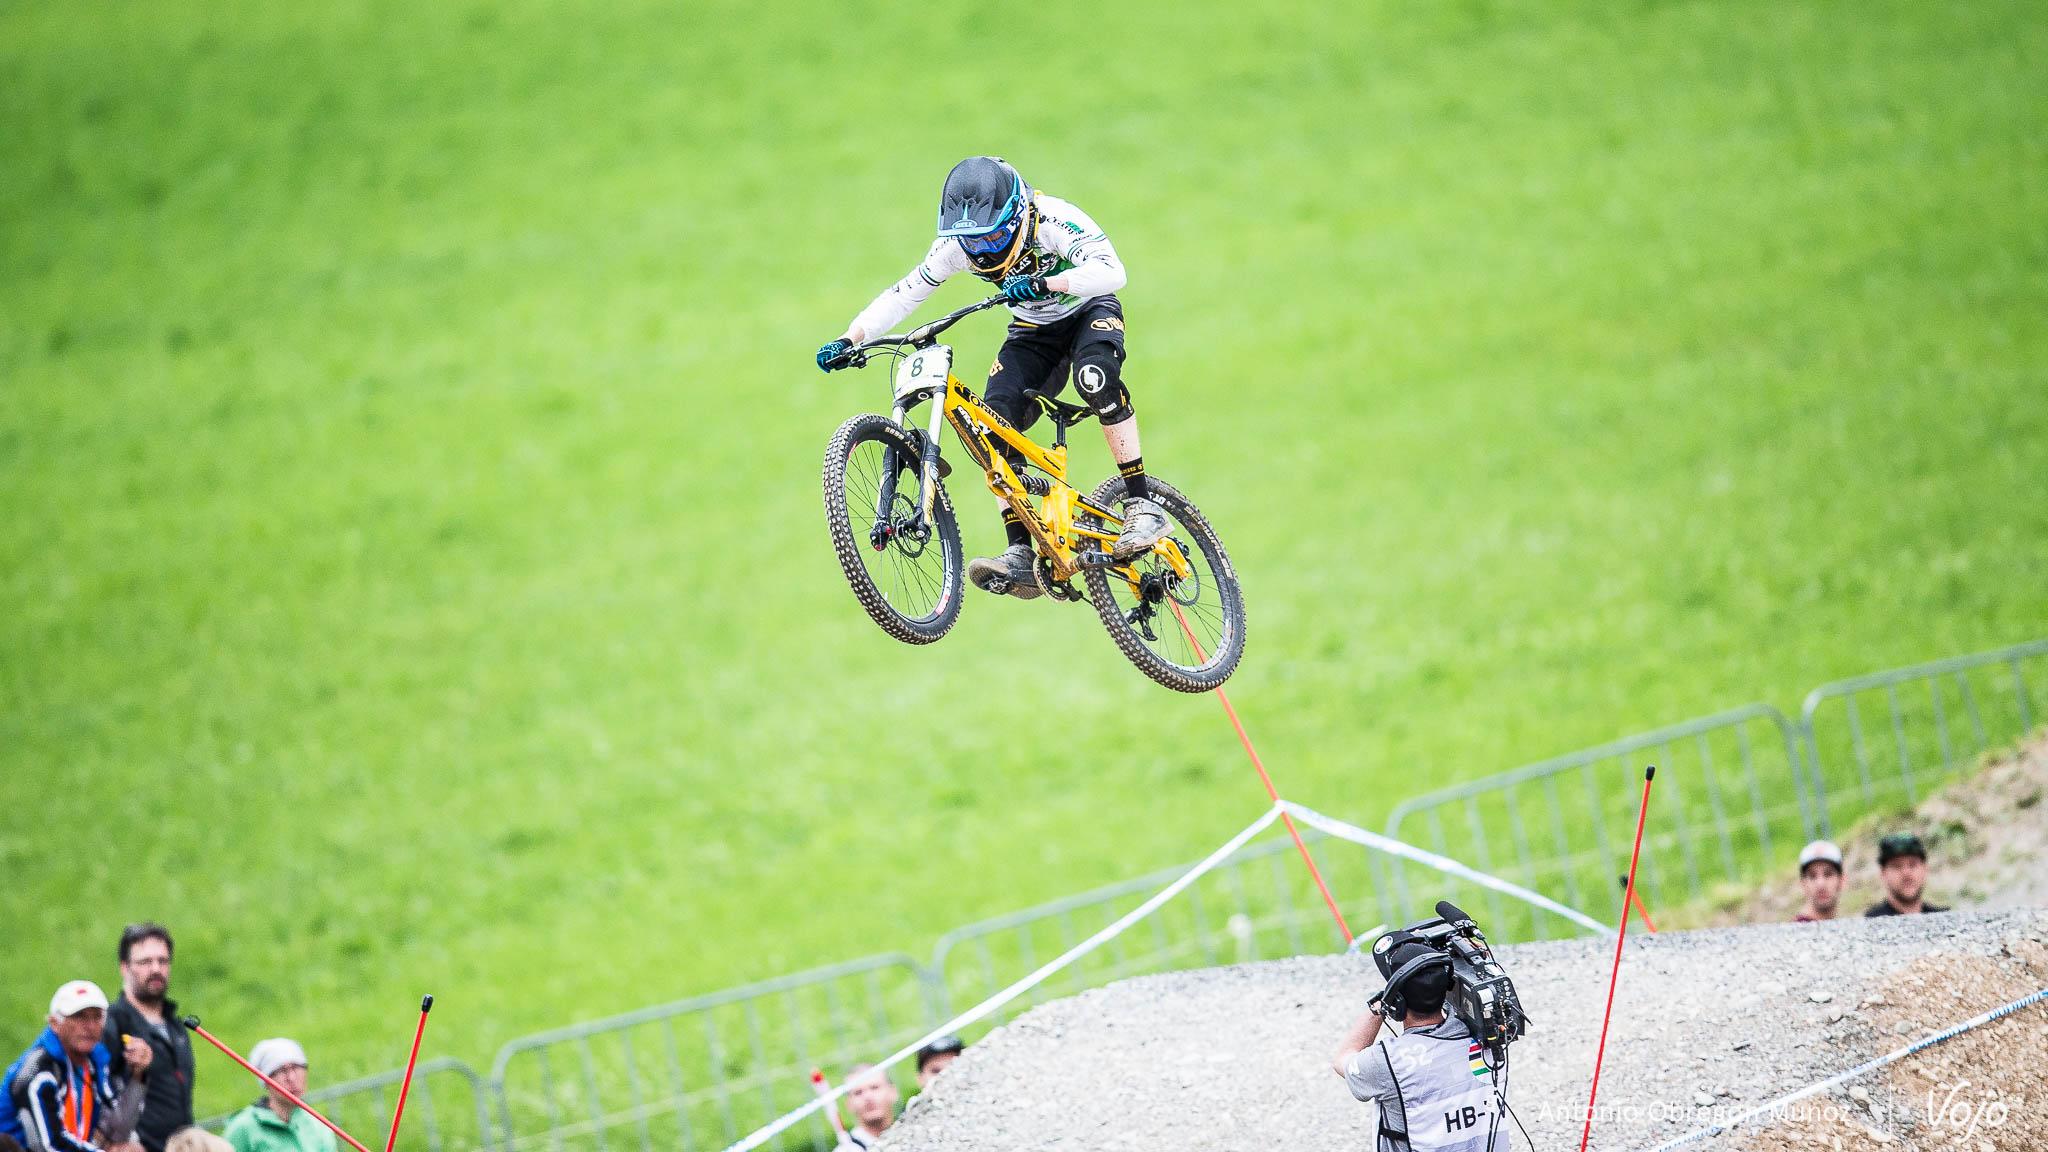 Leogang_UCI_World_Cup_DH_2015_(Porfolio)_(Dickson)_(Copyright_Antonio_Obregon_VojoMag-59